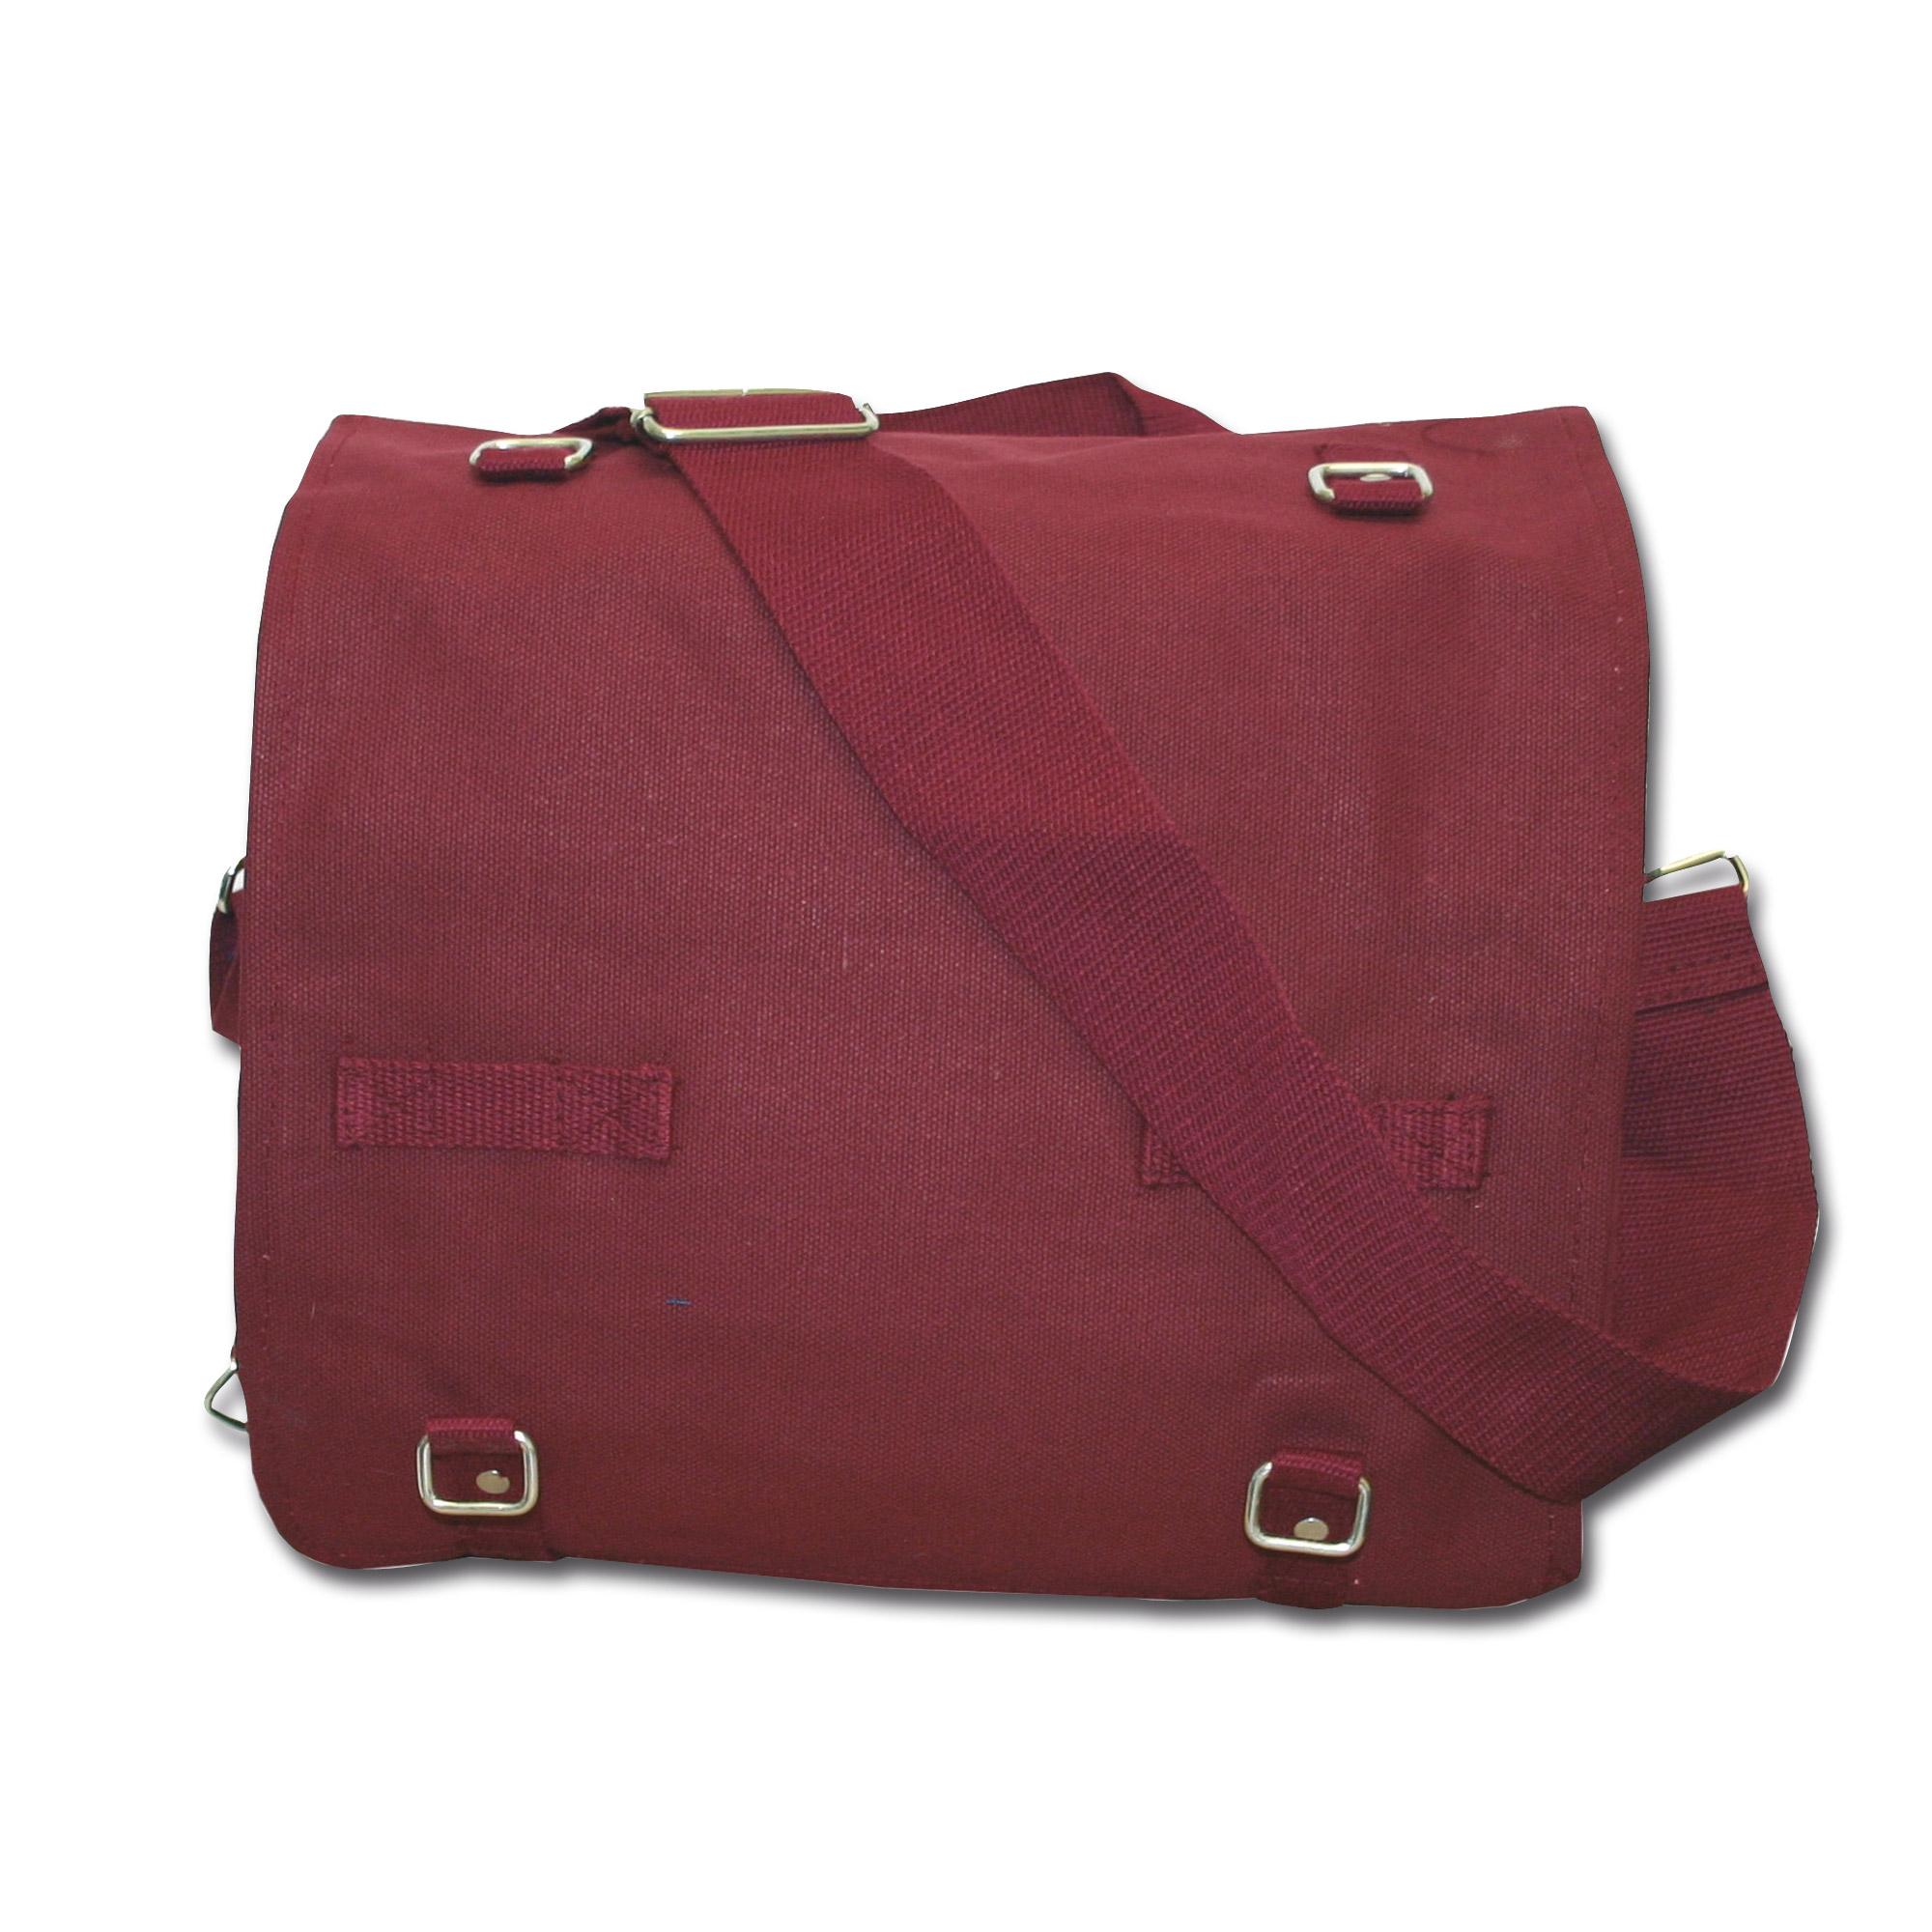 BW Packtasche bordeaux